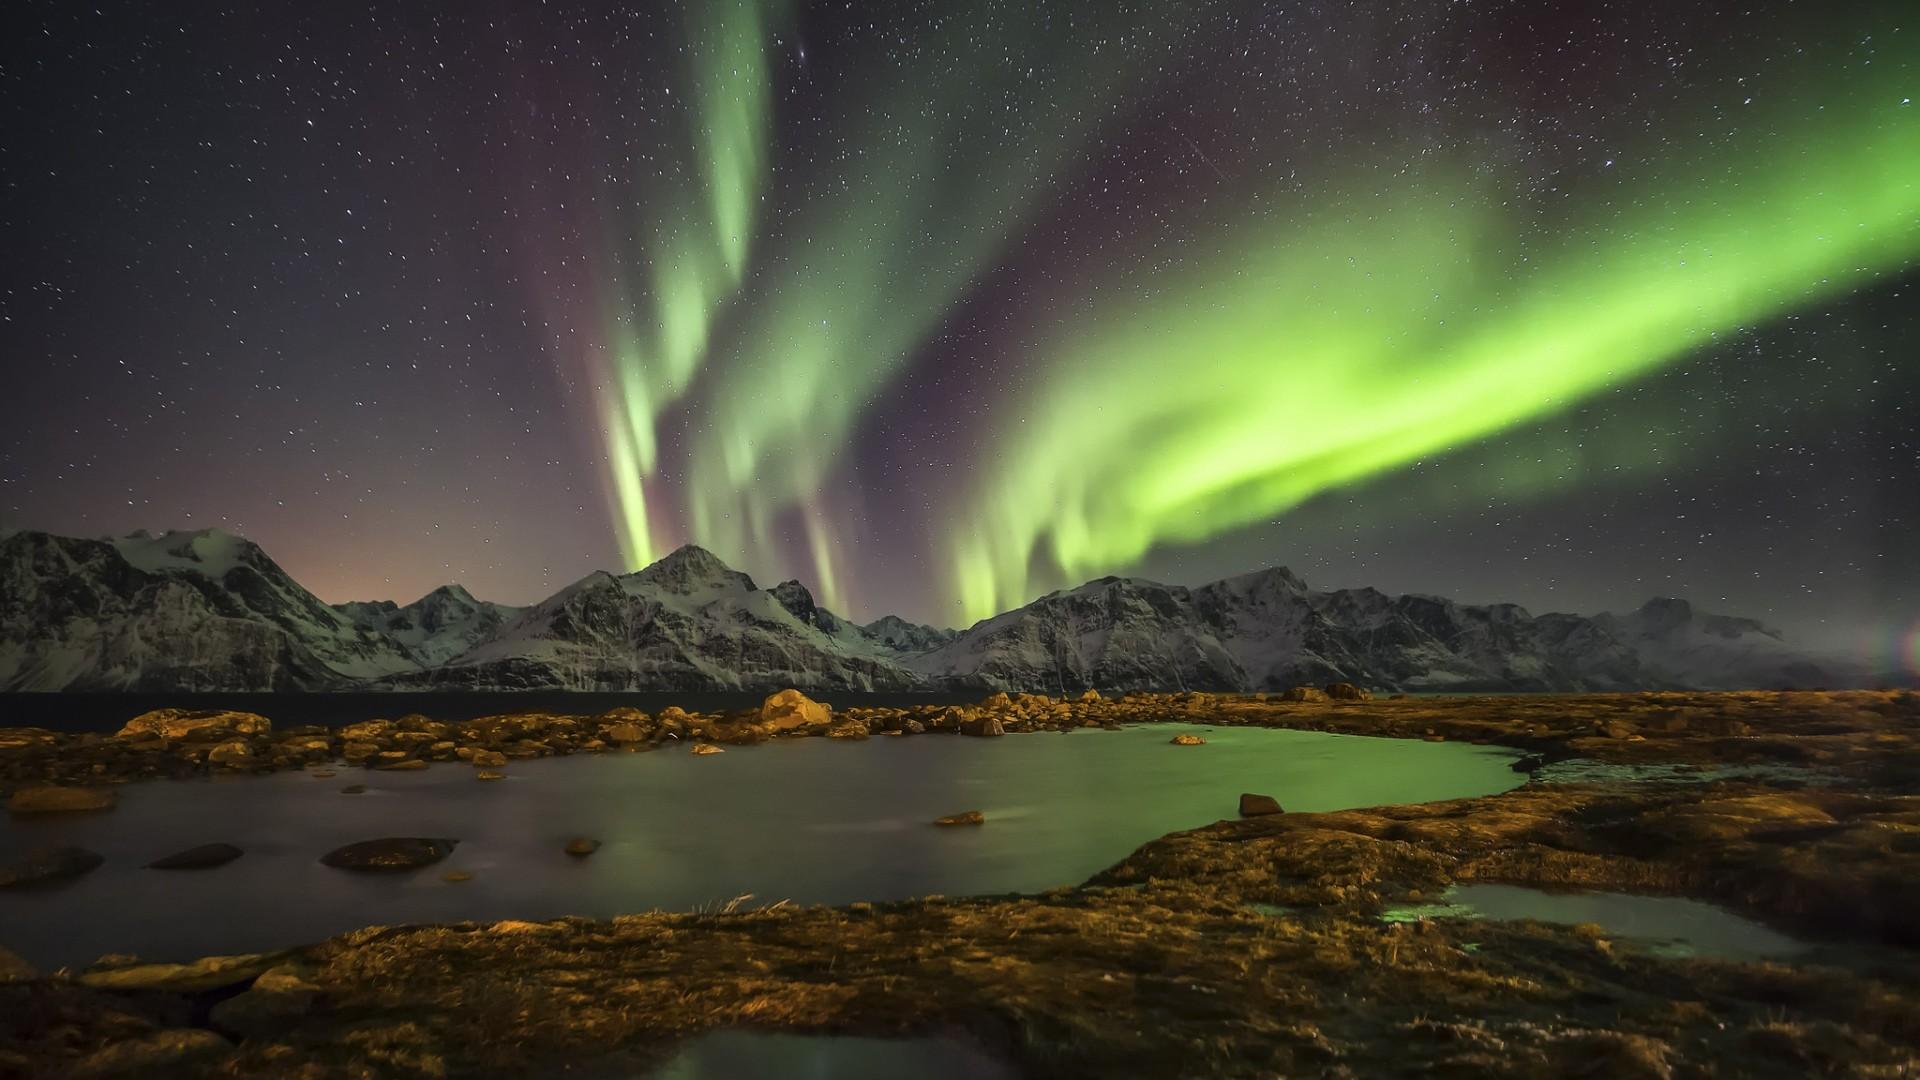 Hd northern lights wallpaper 70 images - Night light hd wallpaper ...